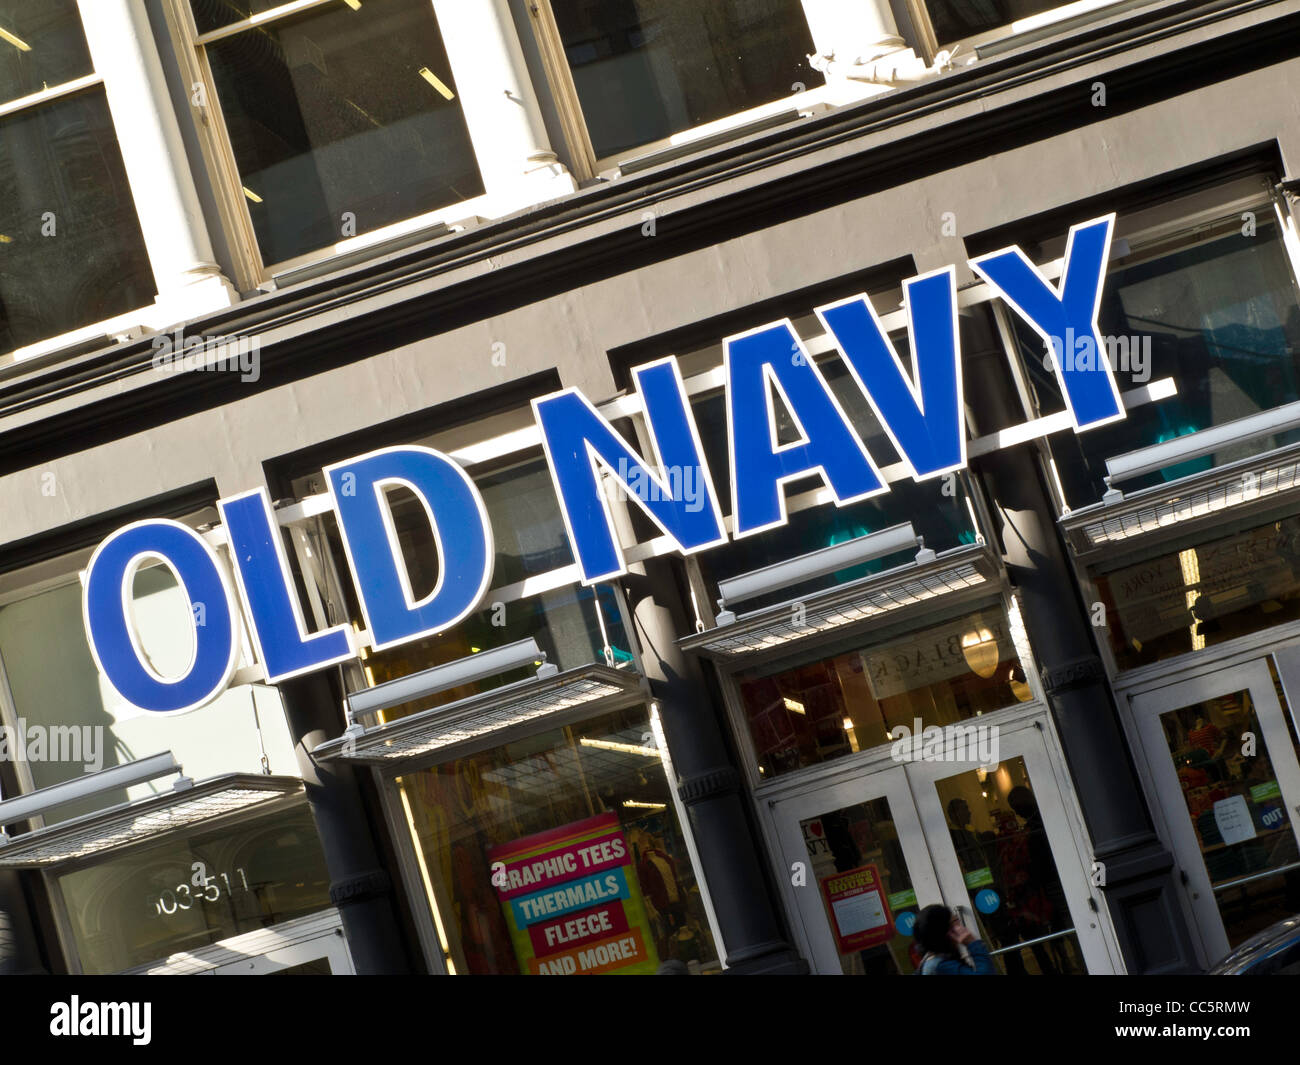 Us navy logo stock photos us navy logo stock images alamy old navy retail storefront stock image buycottarizona